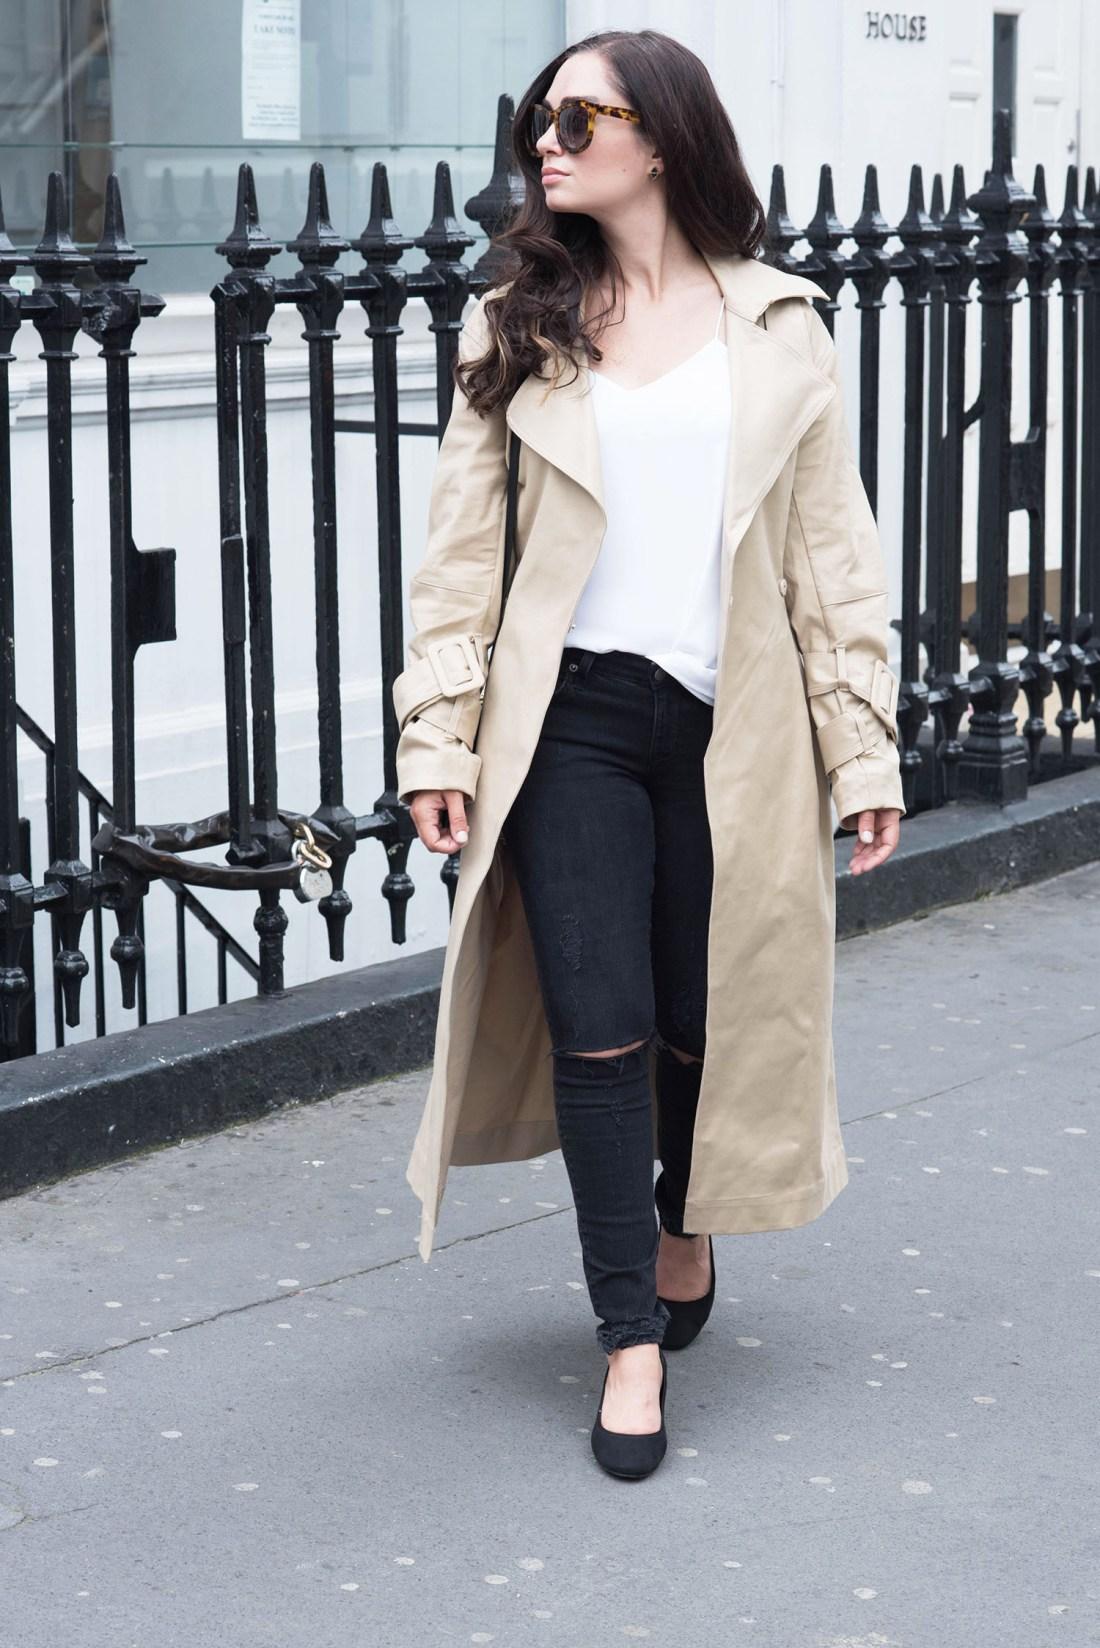 Winnipeg fashion blogger Cee Fardoe of Coco & Vera walks in London wearing Lovers + Friends jeans and Anine Bing Los Angeles sunglasses